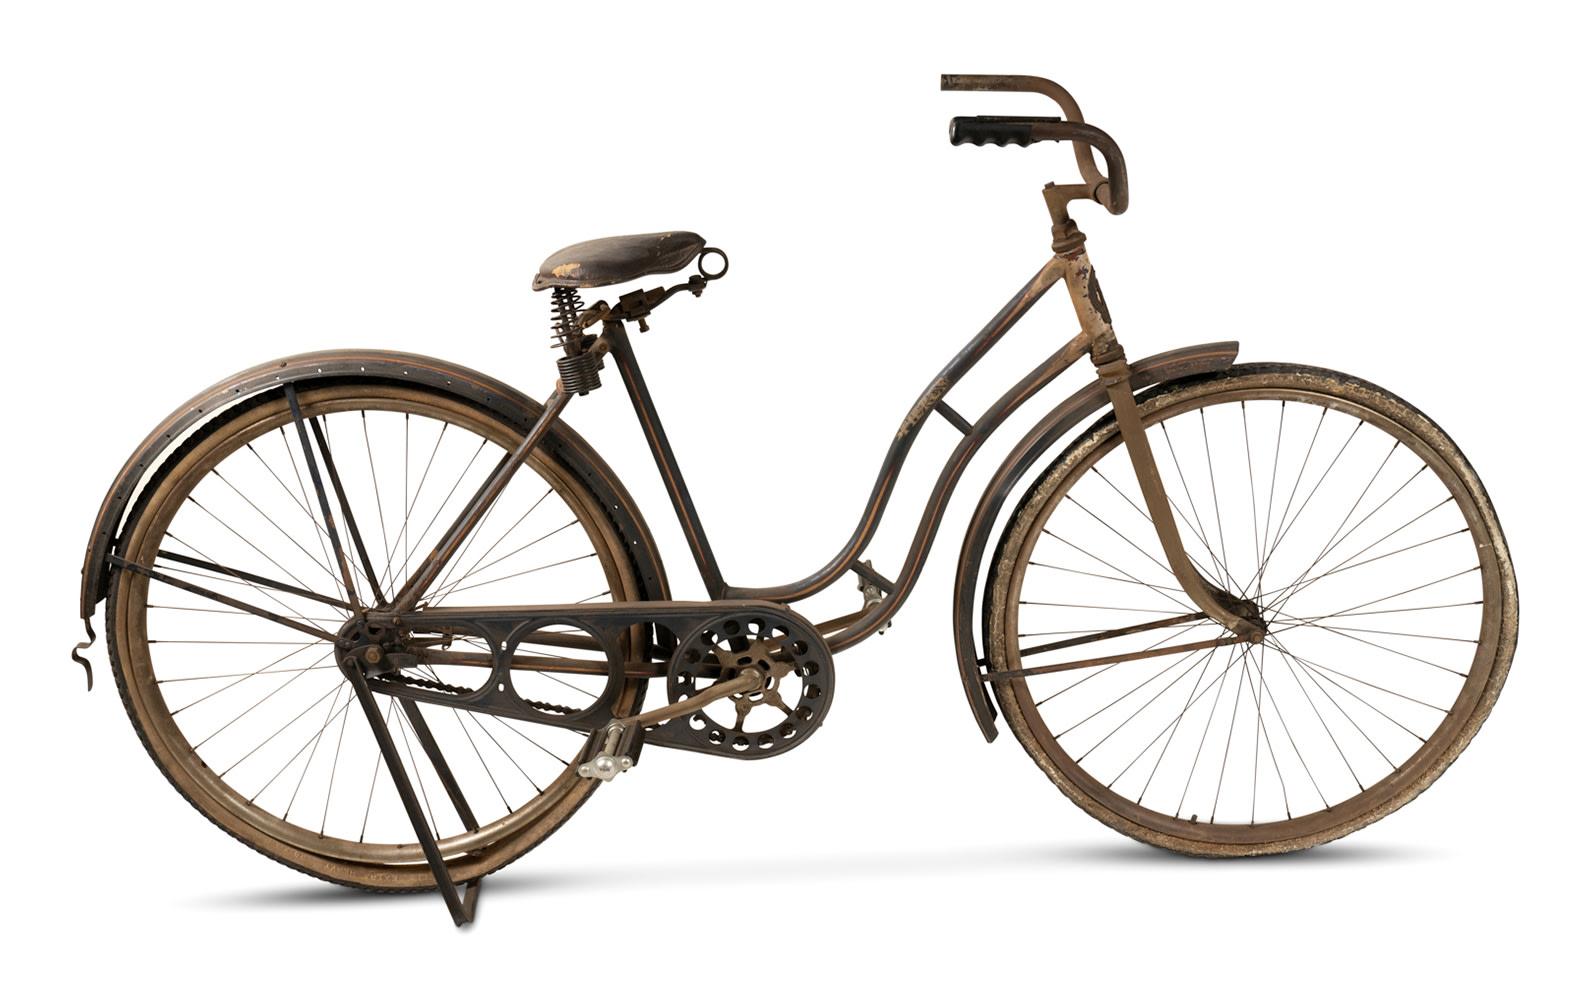 Prod/O21E - Phil Hill C 2021/C0082_1930s Pierce Arrow Bicycle/C0082_1930s_Pierce_Arrow_Bicycle_1_r8h7ca